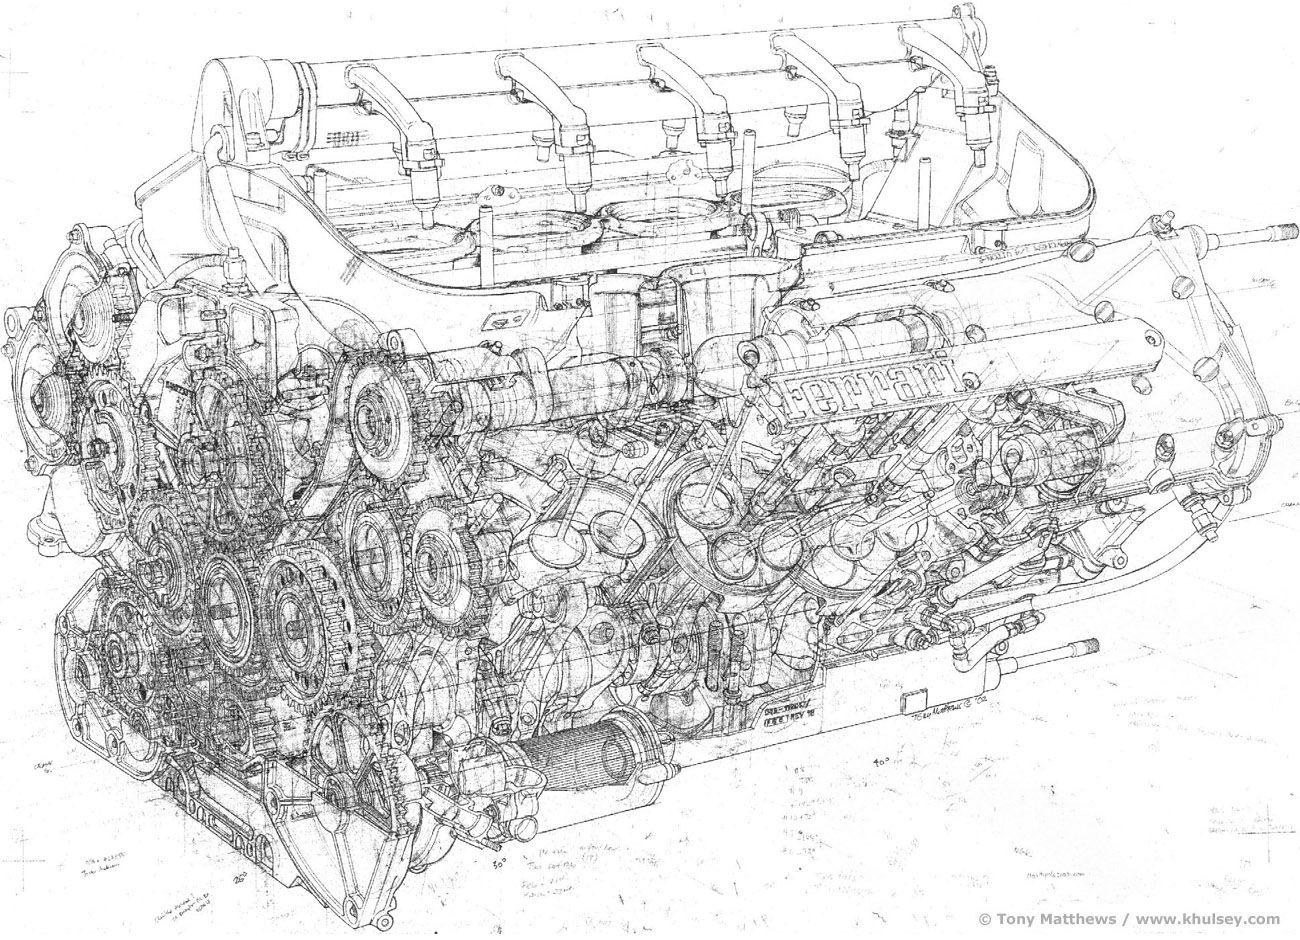 medium resolution of complete ferrari f1 engine drawing by t matthews